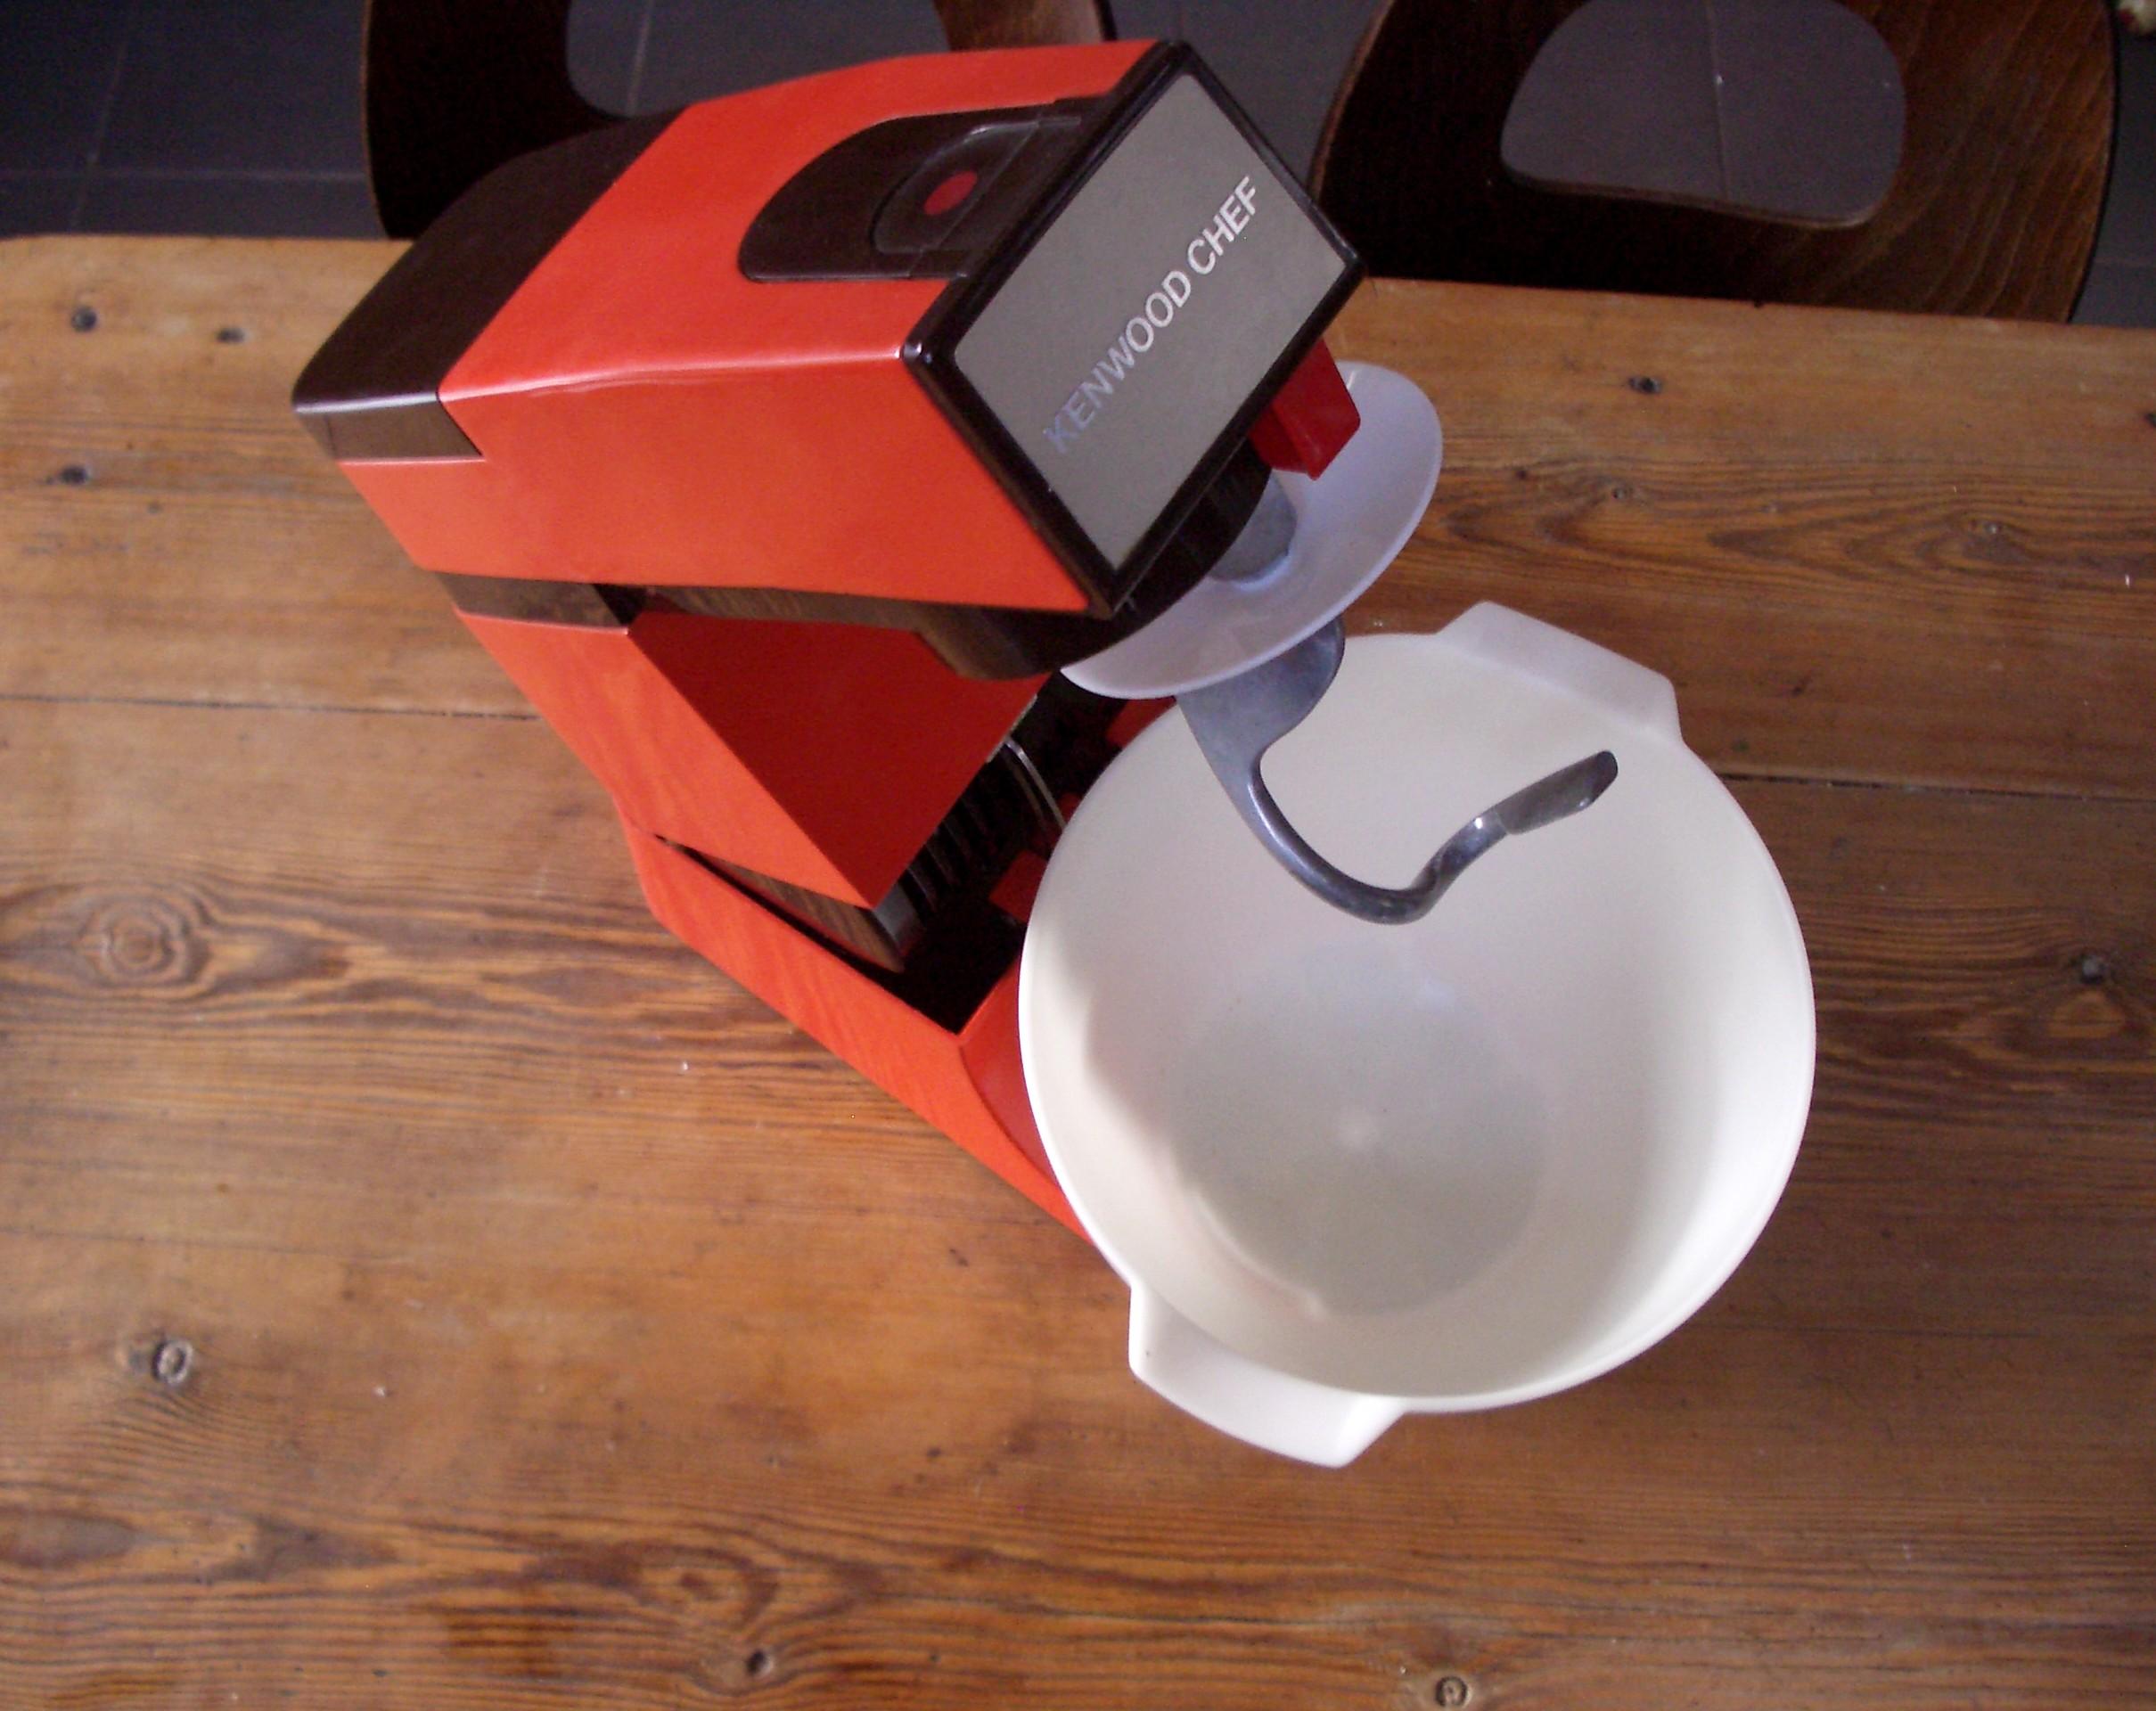 robot cuisine multifiction petrin kenwood chef a 901 orange vintage mixeur. Black Bedroom Furniture Sets. Home Design Ideas